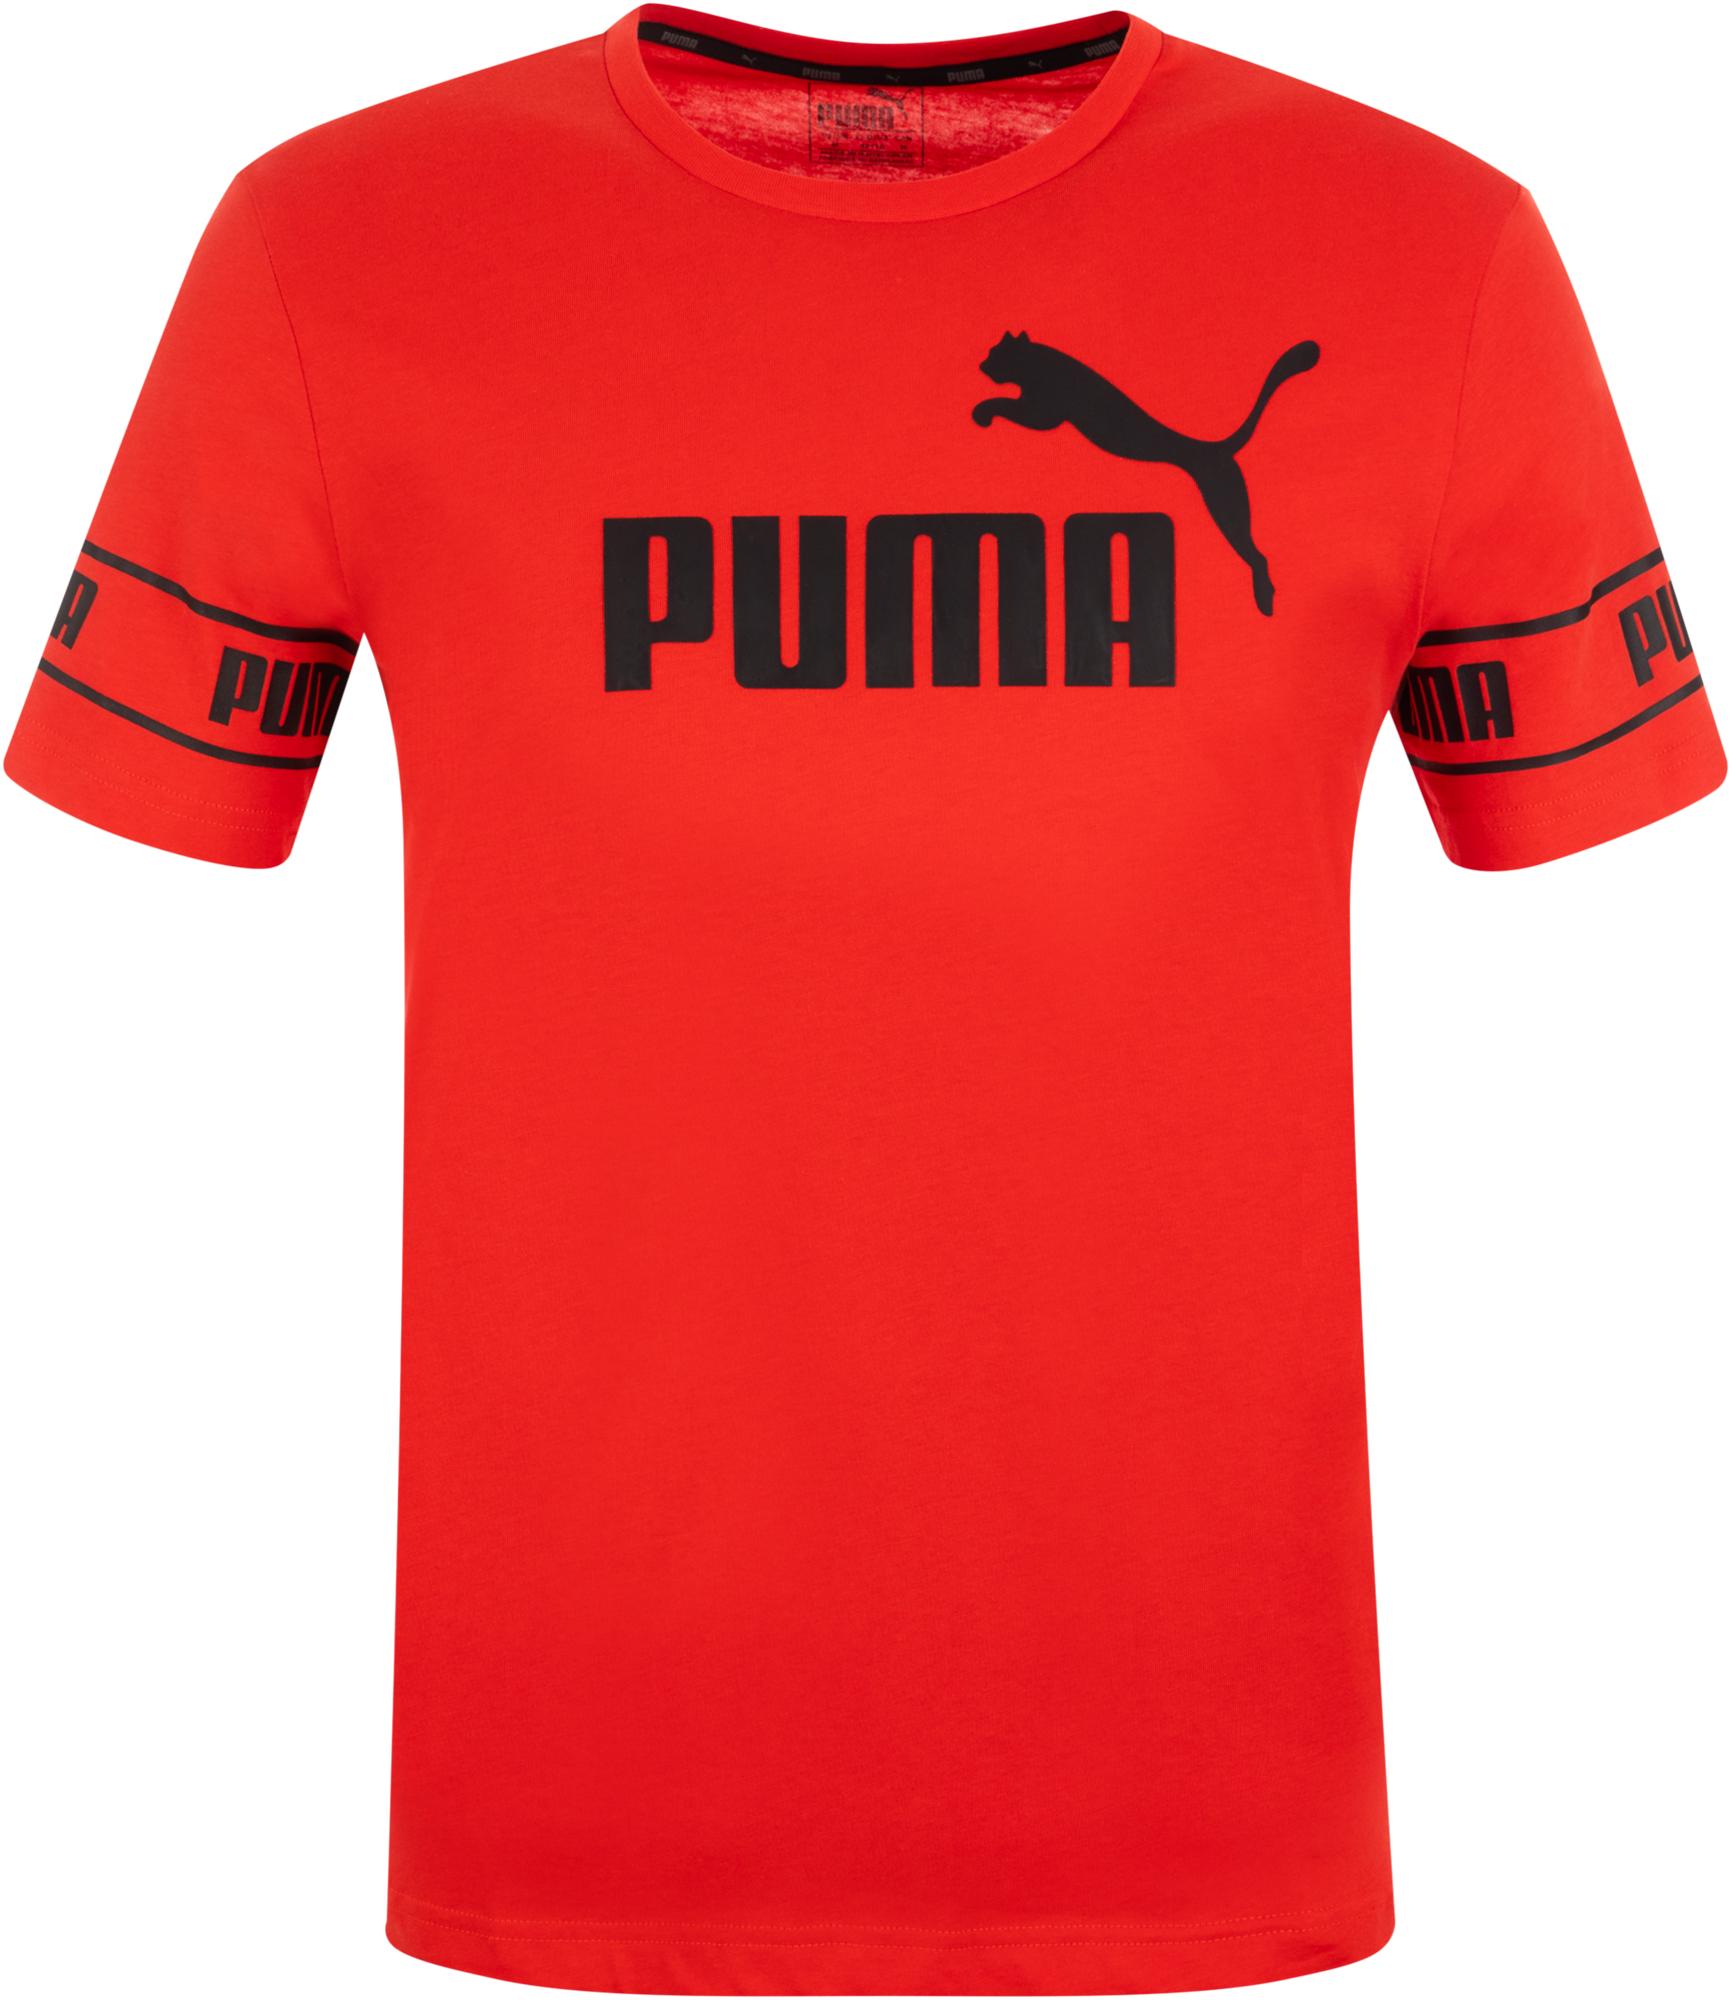 Puma Футболка мужская Puma Big Logo, размер 44-46 puma мяч футбольный puma ka big cat ball